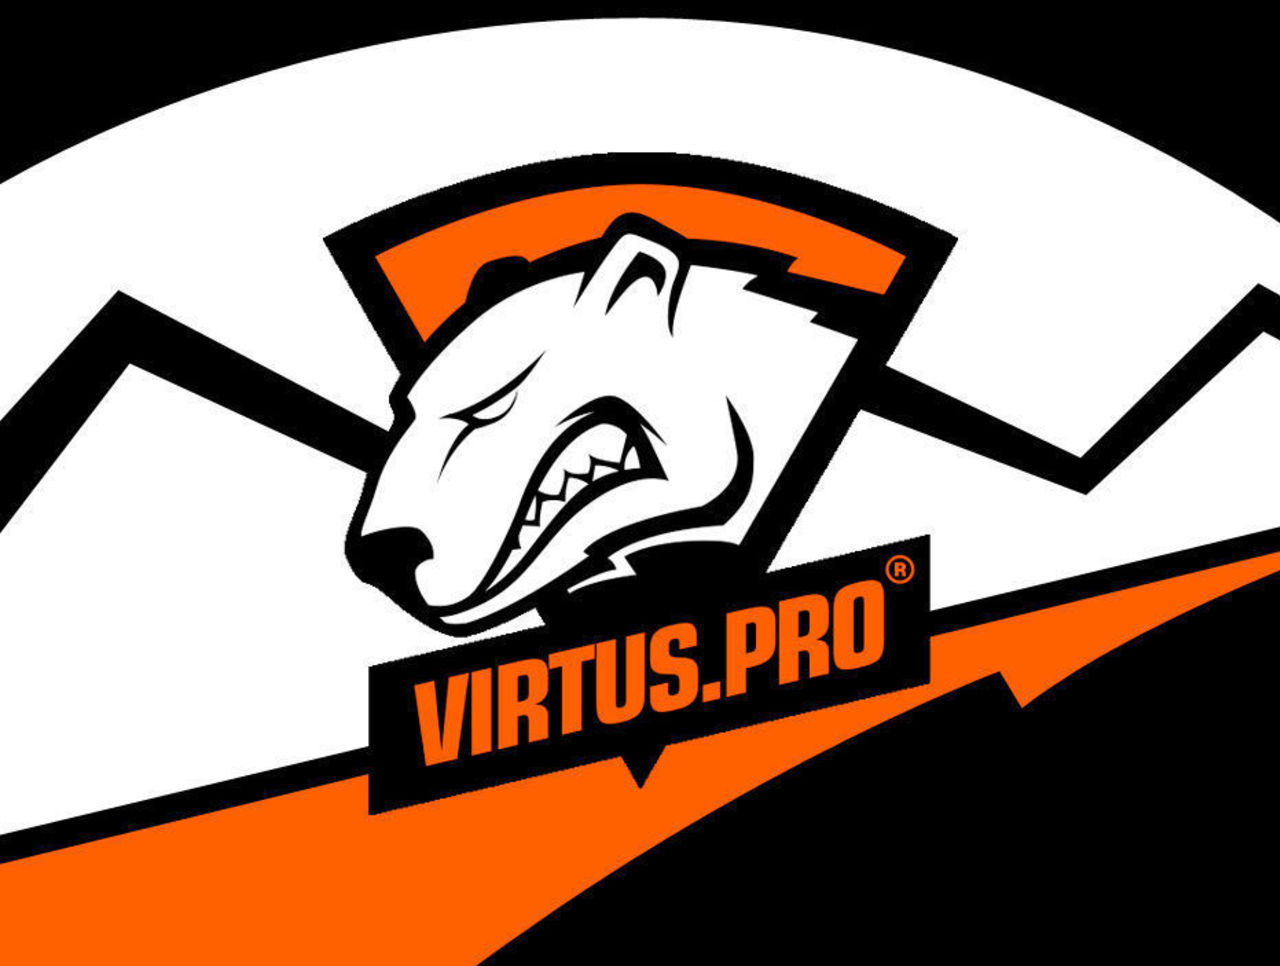 Virtus Pro Dota 2